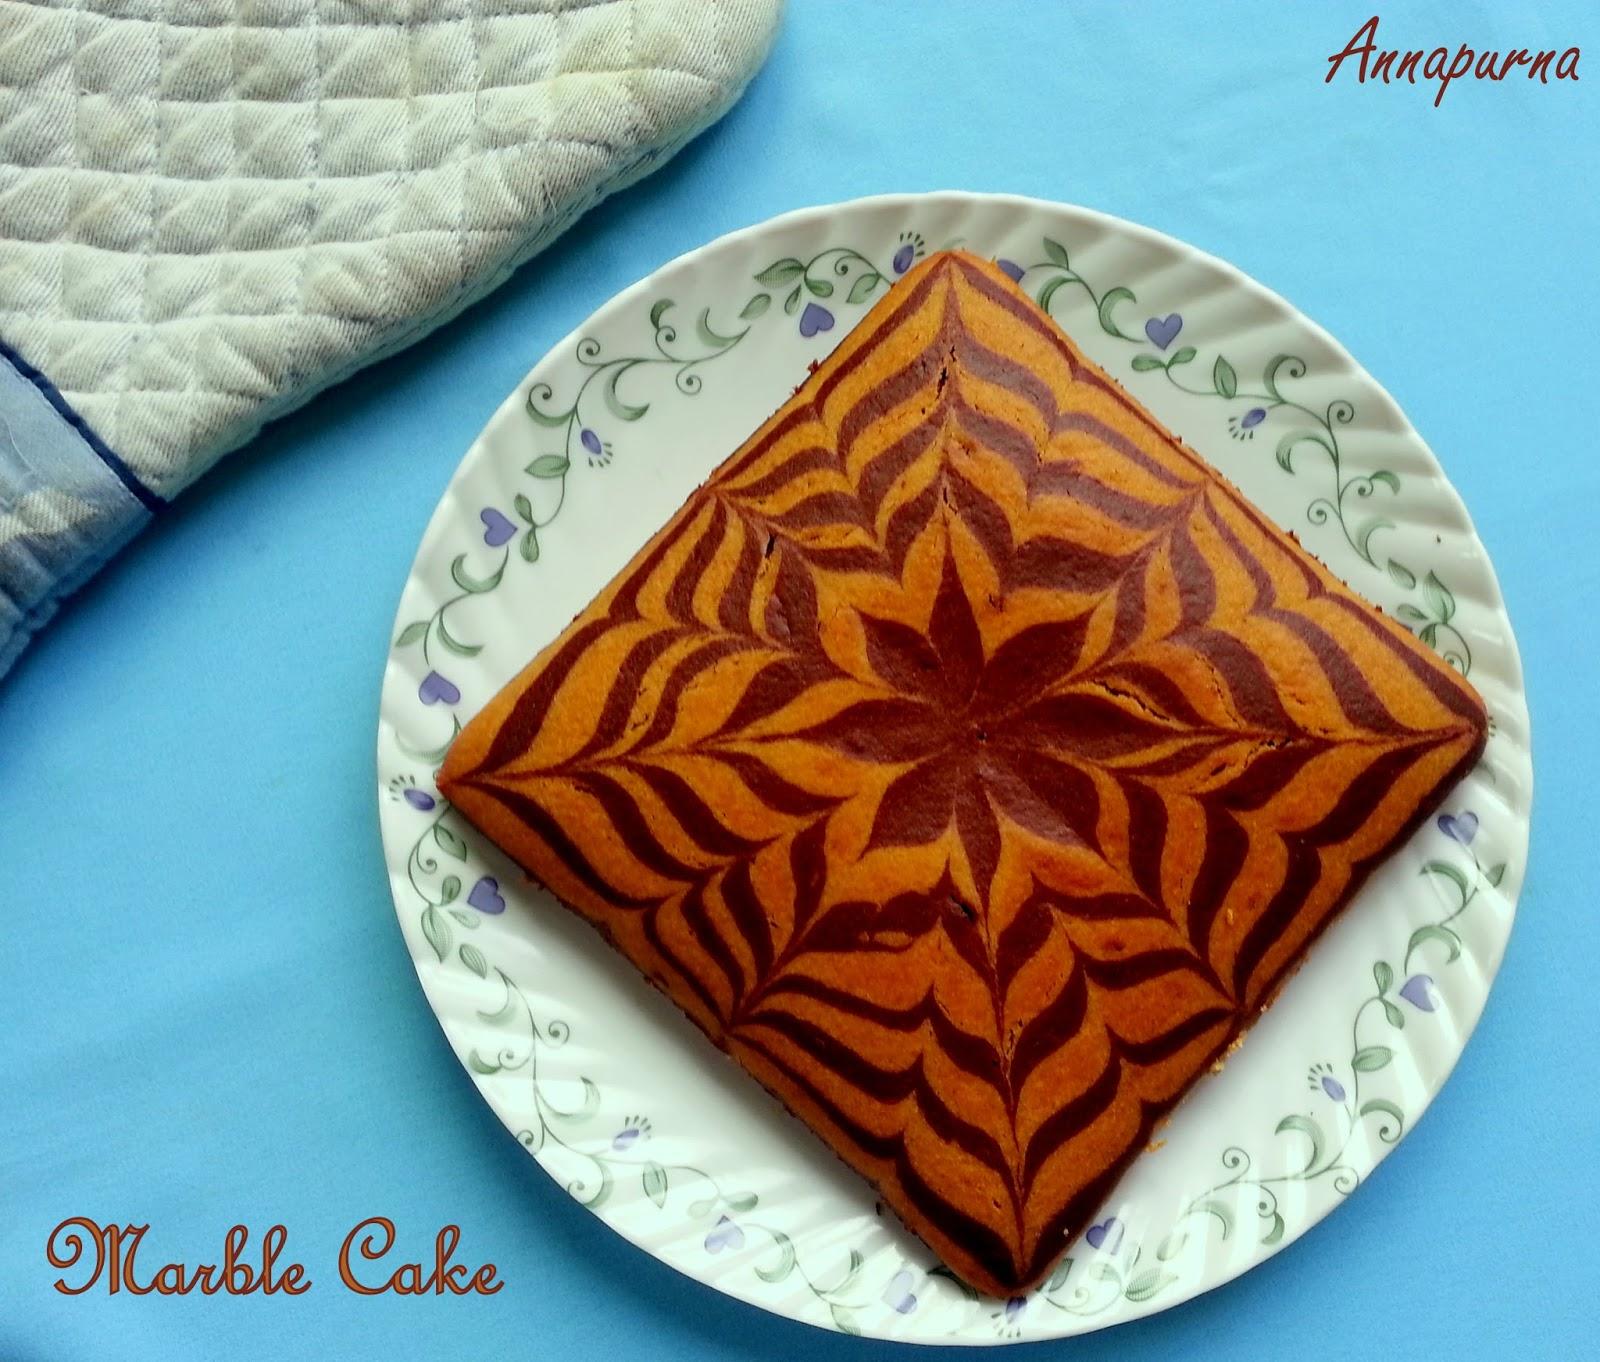 Annapurna Eggless Butterless Marble Cake Zebra Cake Recipe